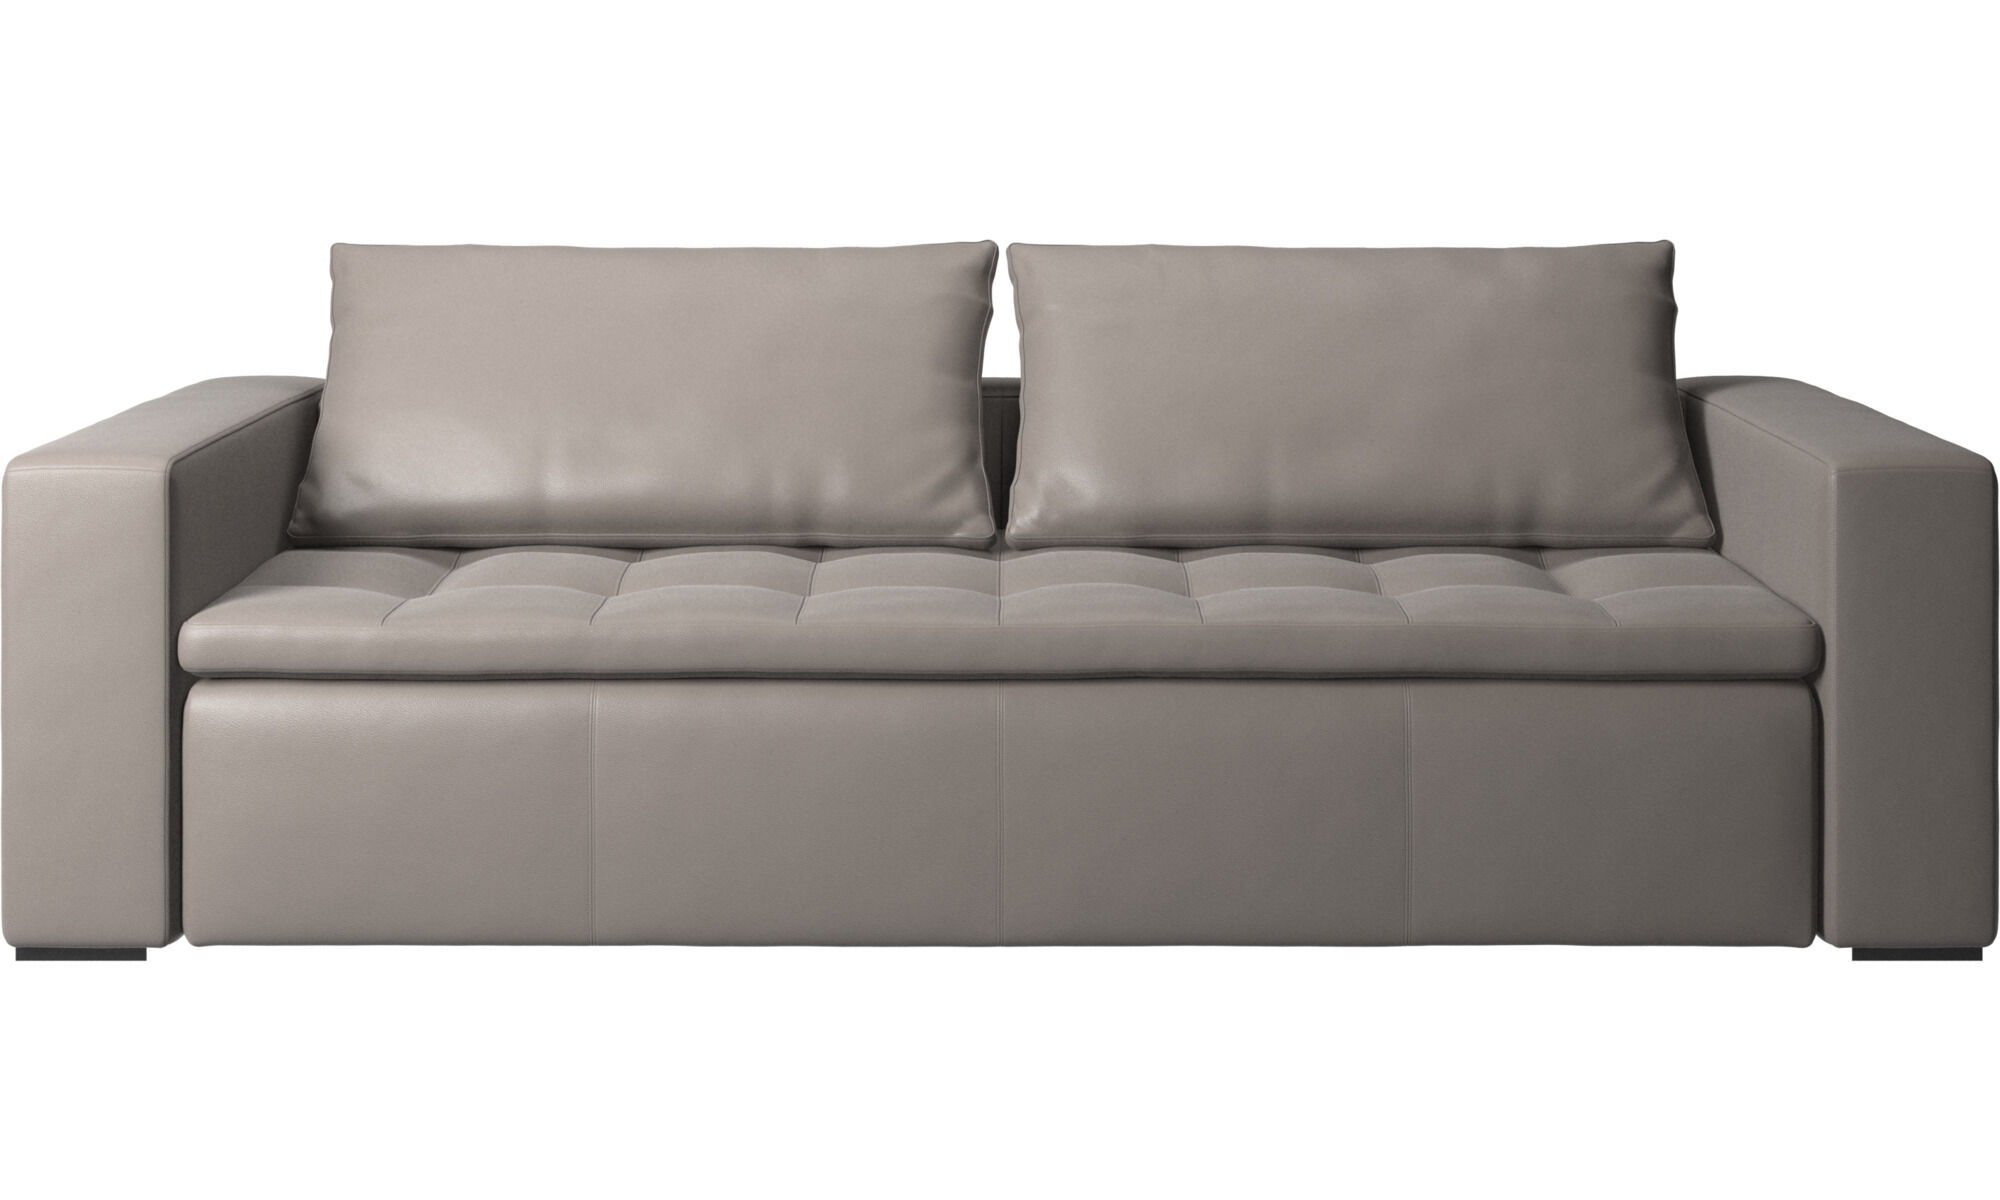 3 Sitzer Sofas   Mezzo Sofa   Beige   Leder ...